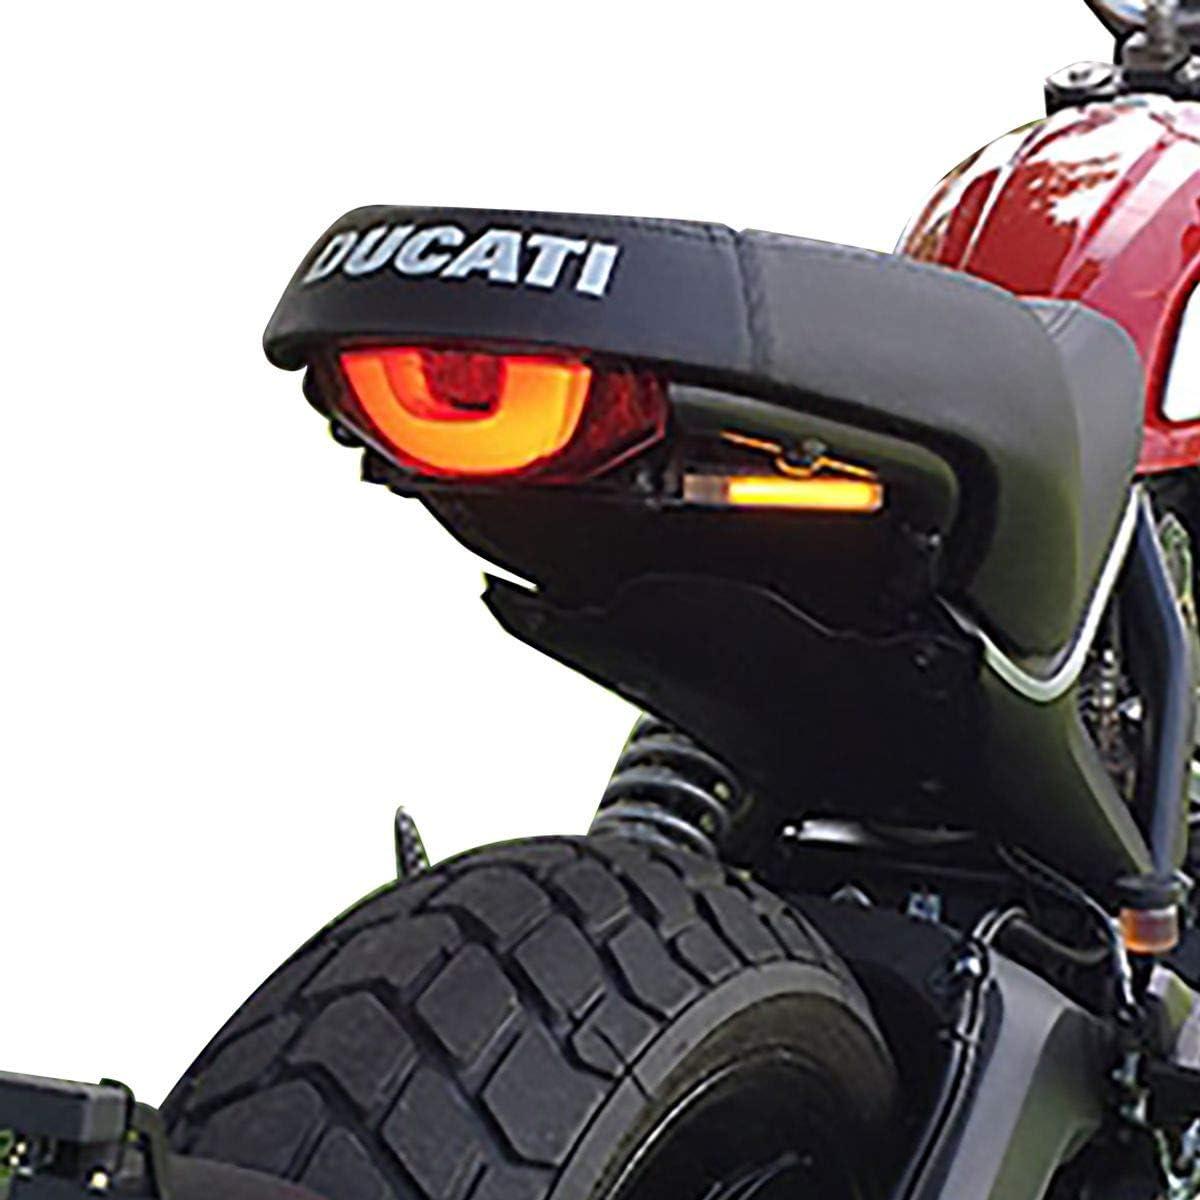 Green TESWNE Universal Motorcycle LED Light Rear License Plate Holder Adjustable Fender Eliminator Bracket for Yamaha for Kawasaki for Ducati